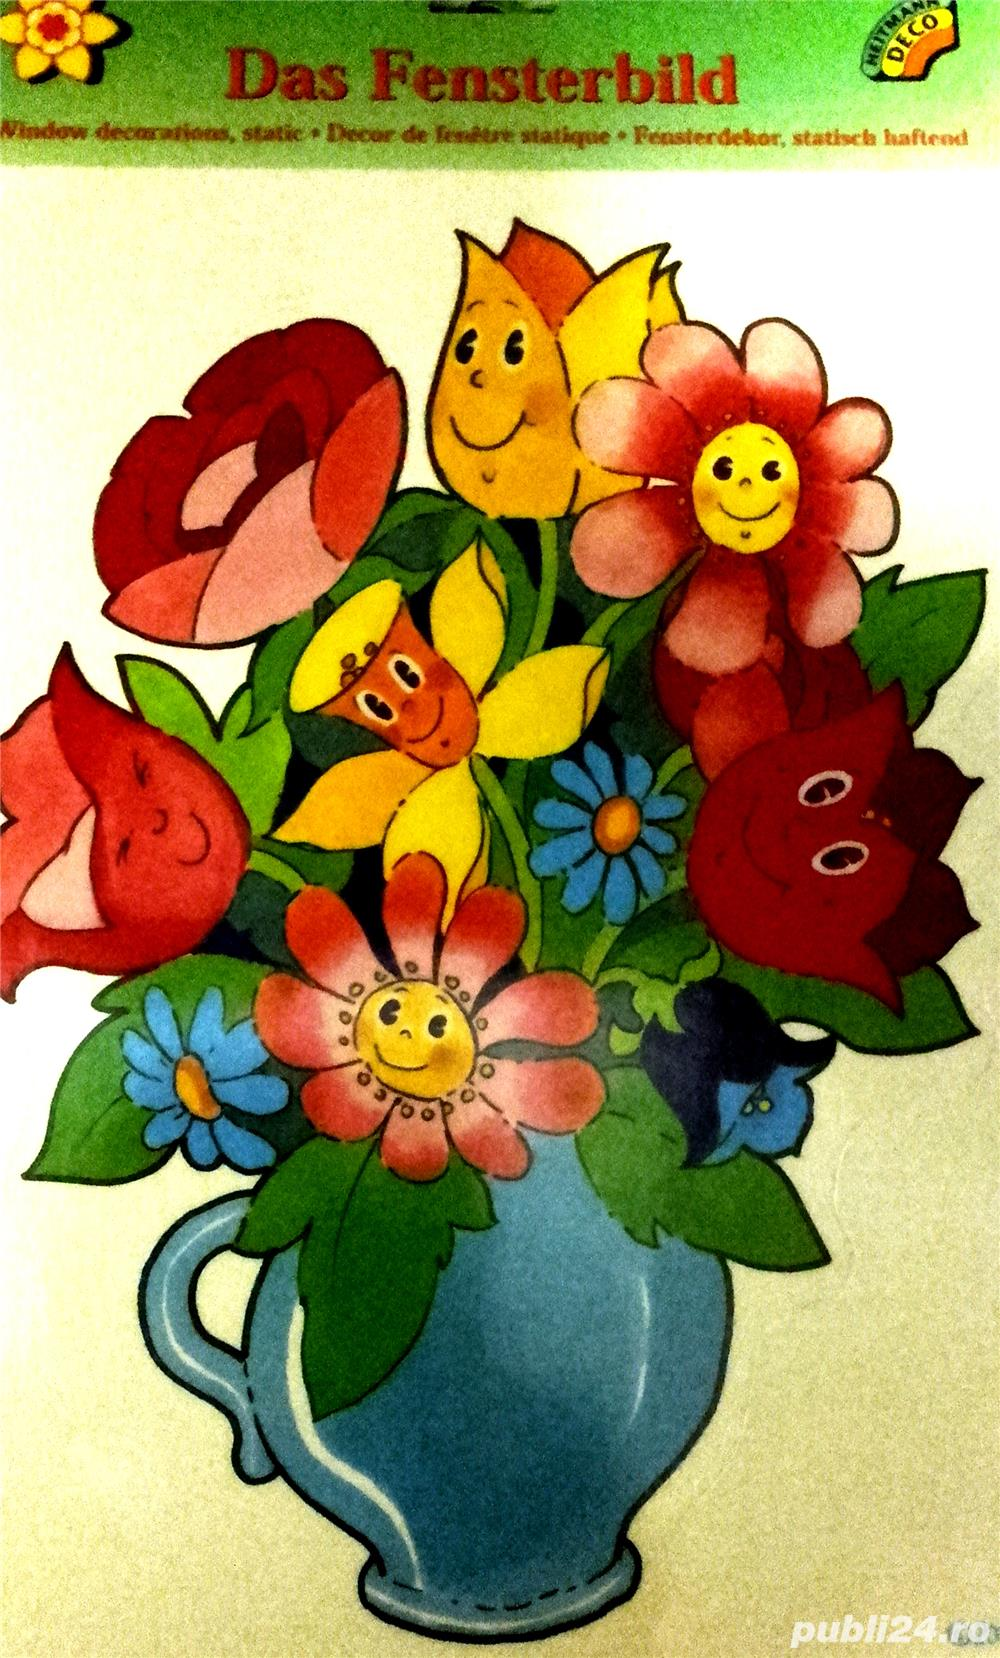 Decoratiune sticker pentru fereastra - vaza cu flori